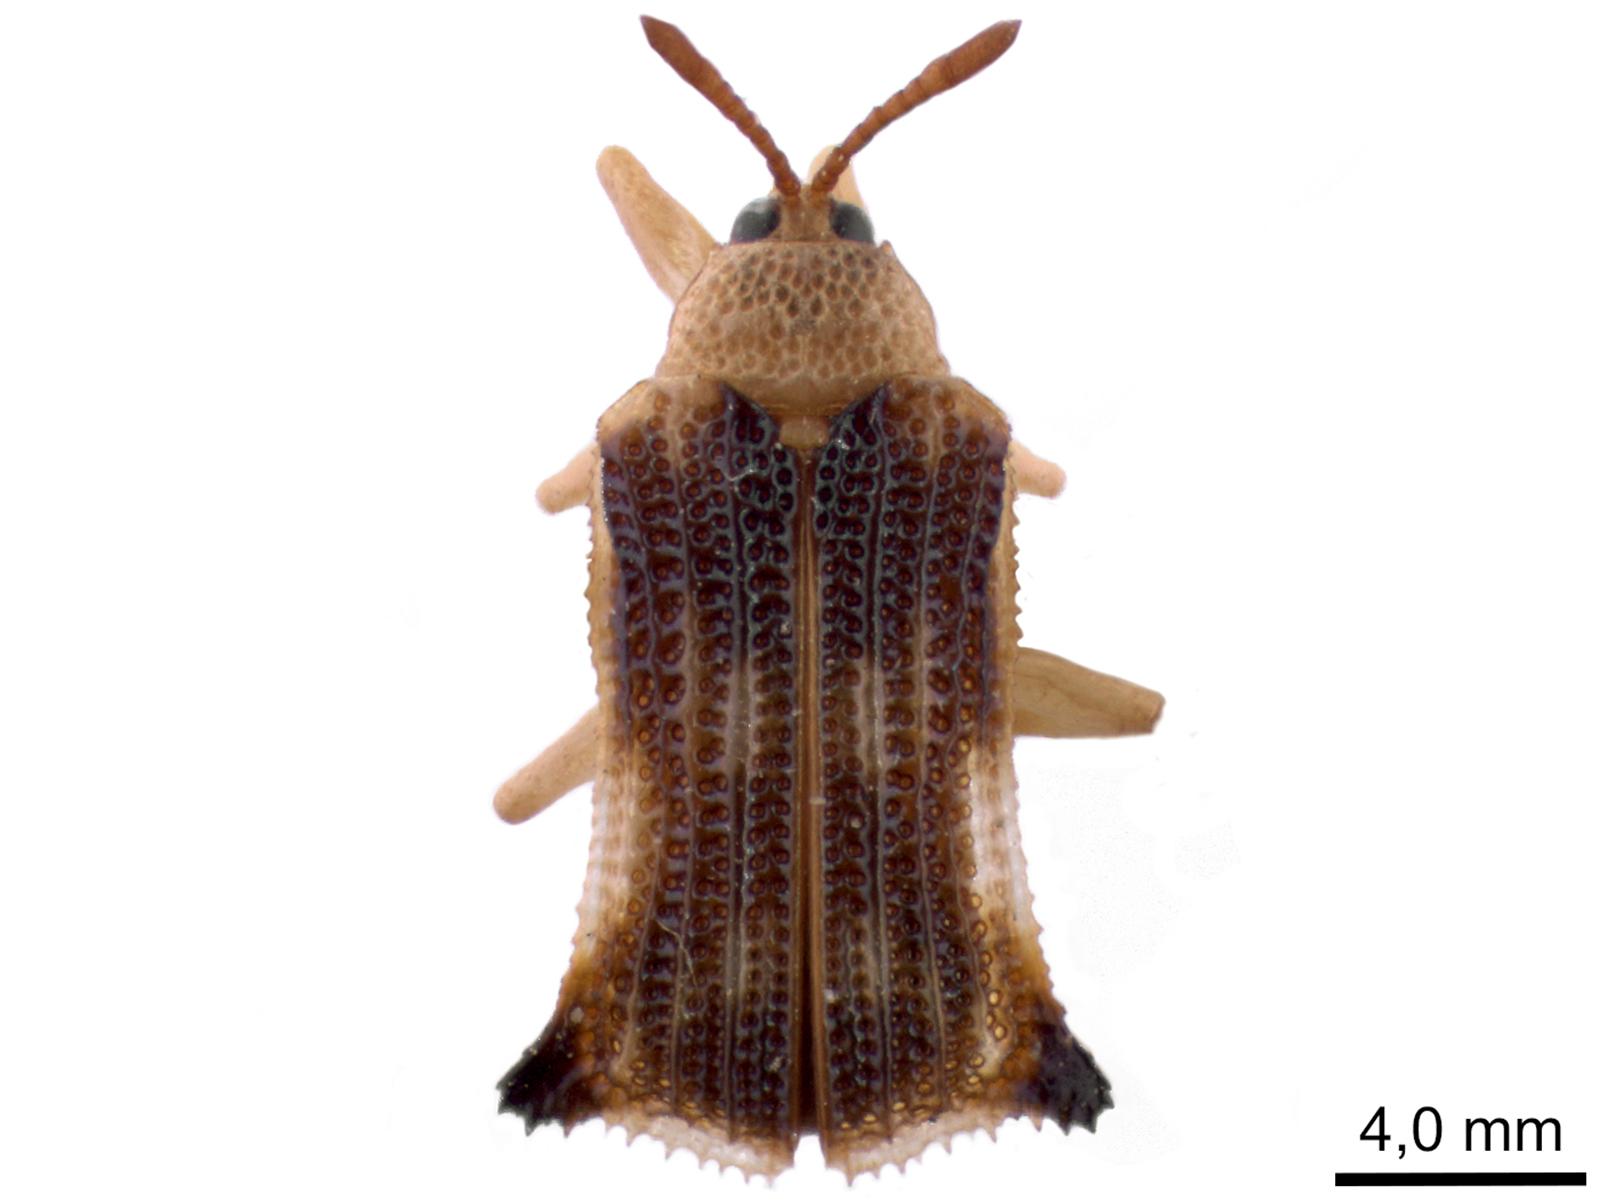 Uroplata spp.